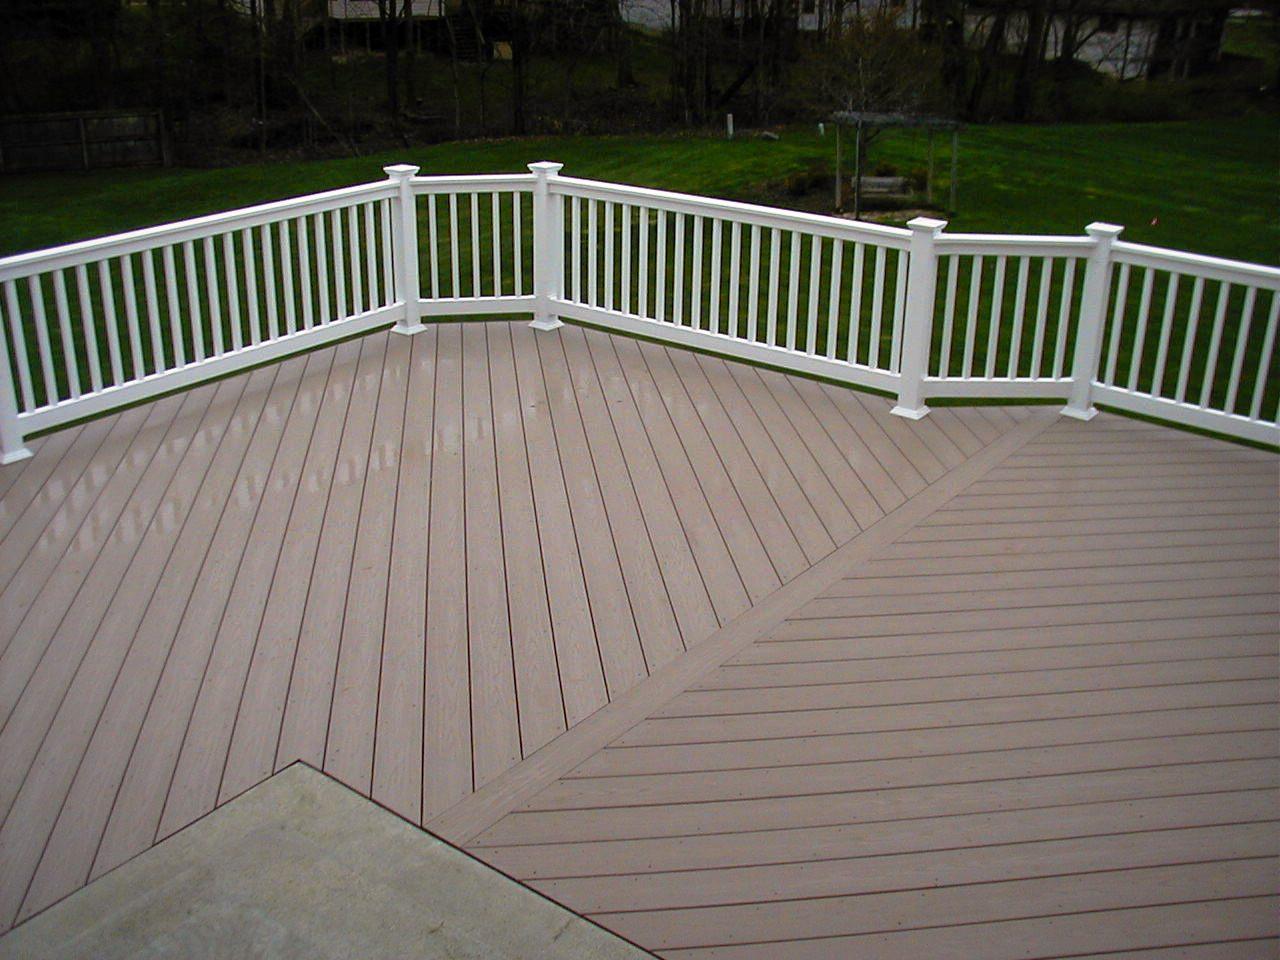 Composite deck builders columbus oh decks